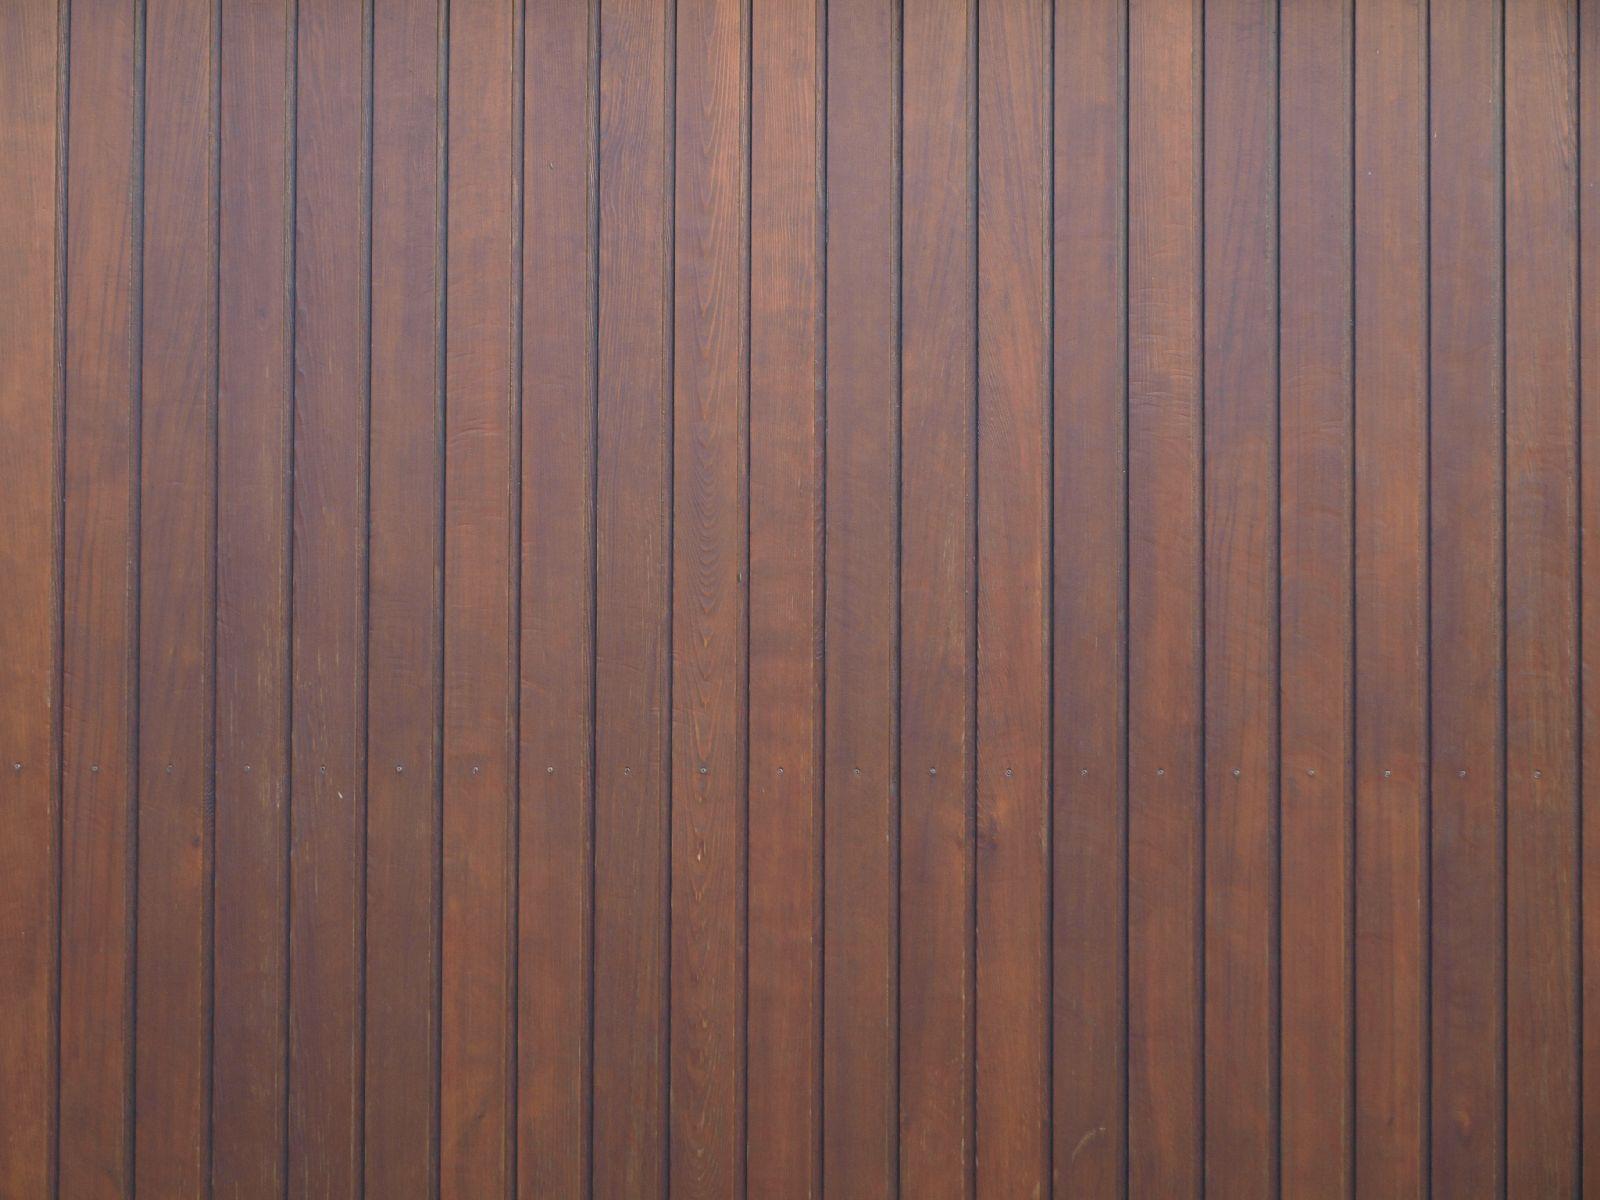 Wood_Texture_A_P4201607